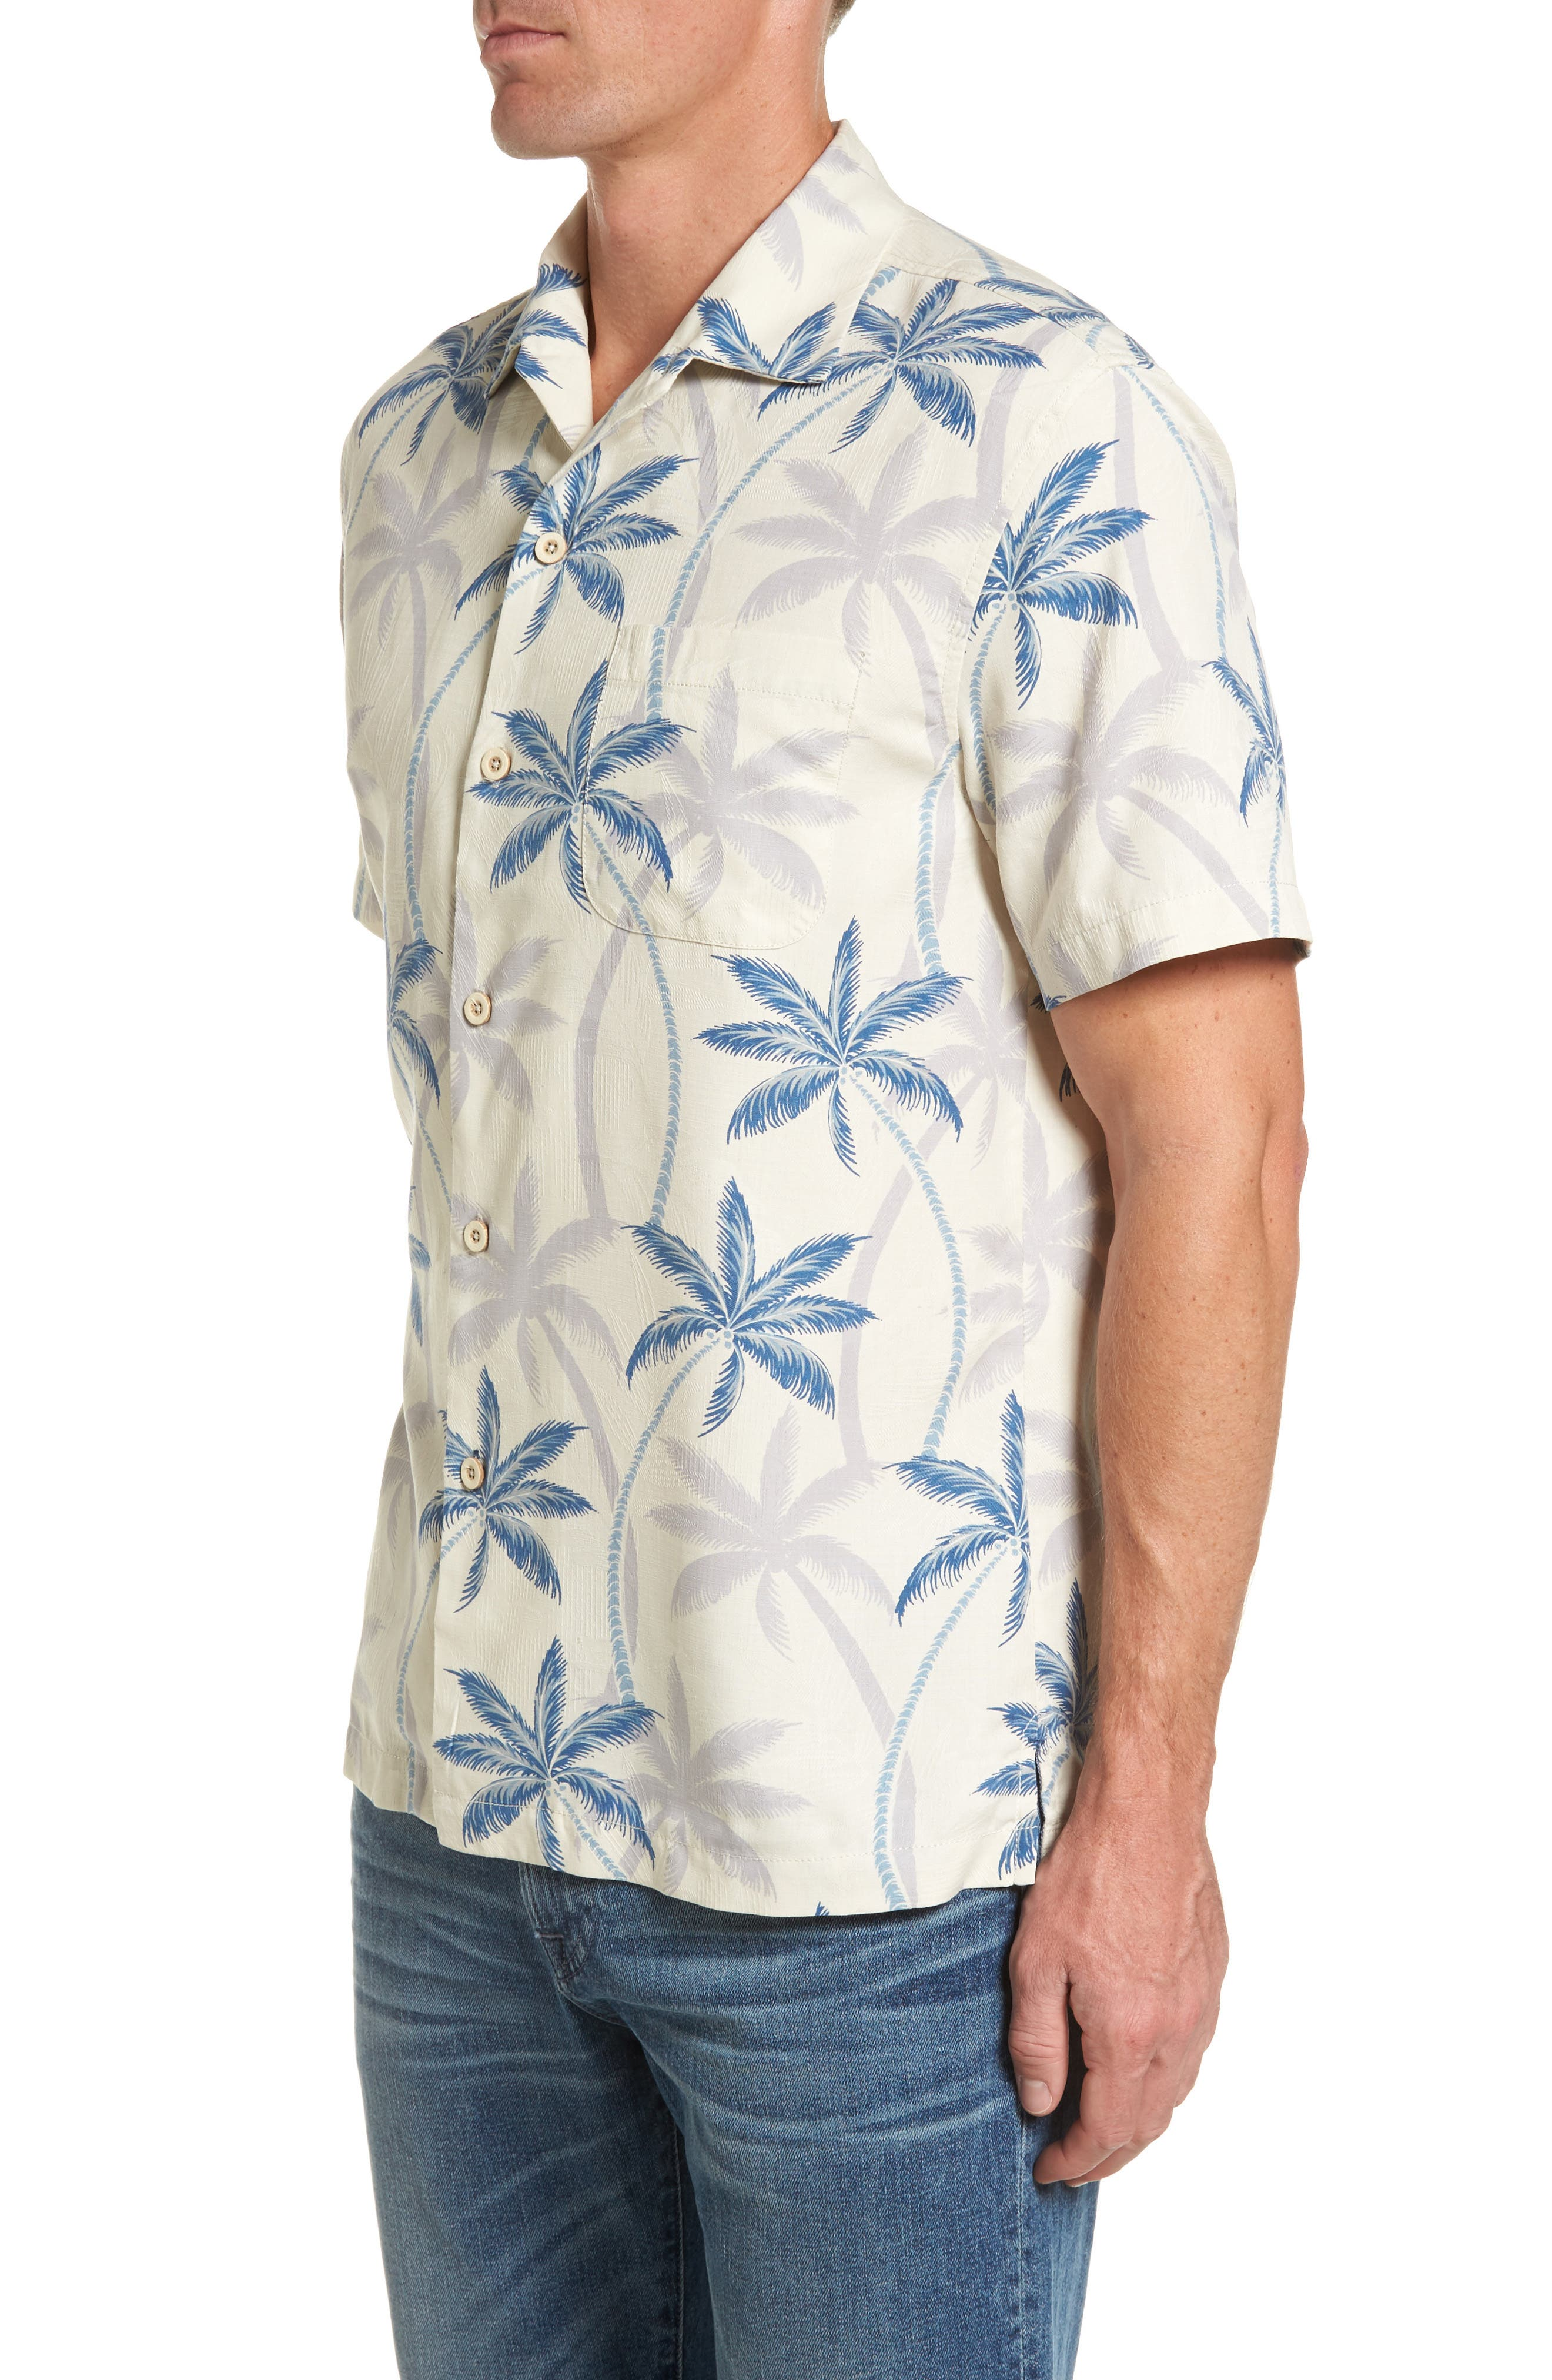 Palmas Palooza Woven Shirt,                             Alternate thumbnail 3, color,                             Continental